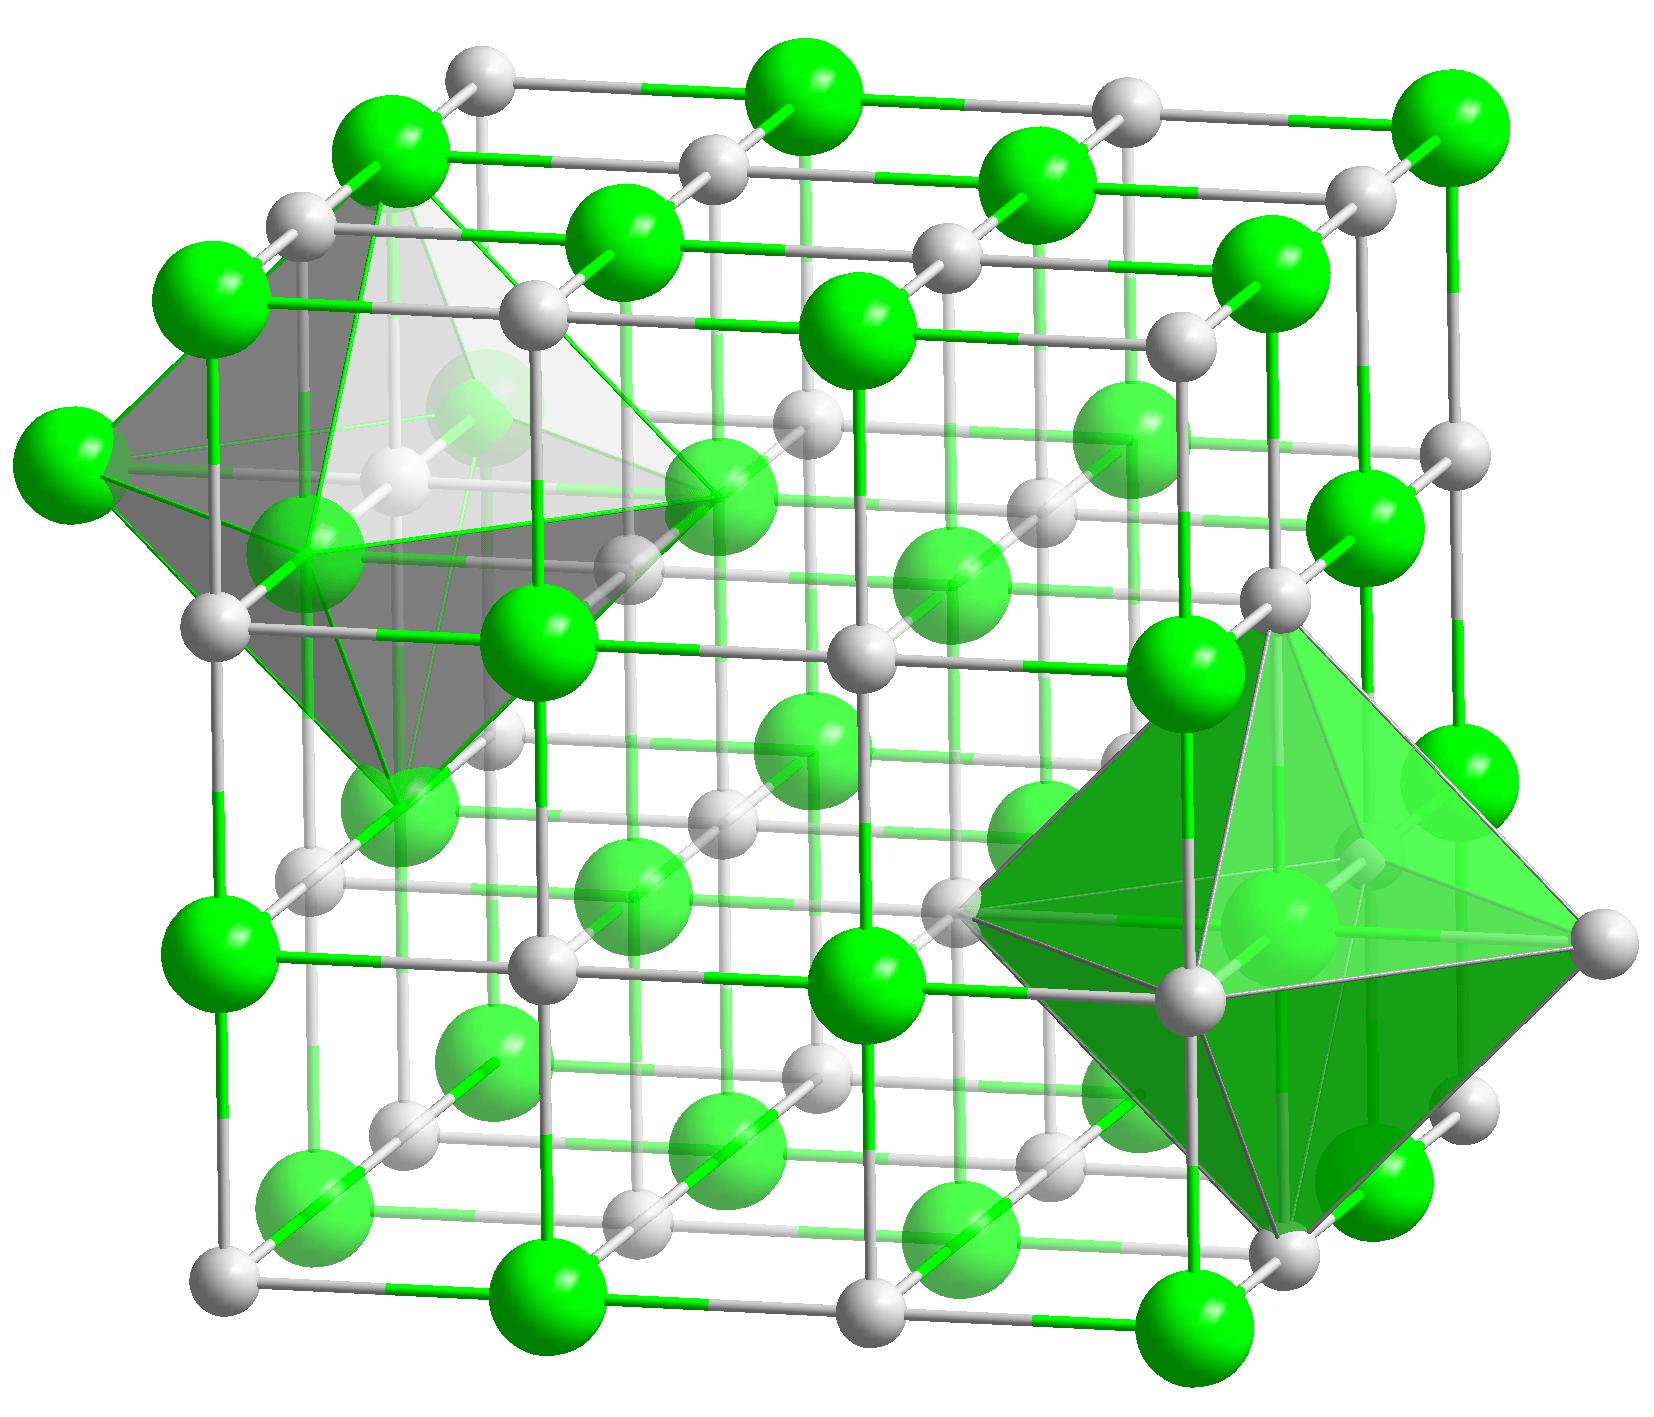 sodium oxide ionic bonding diagram 3 pin rocker switch wiring compounds rock salt structure chloride lattice or